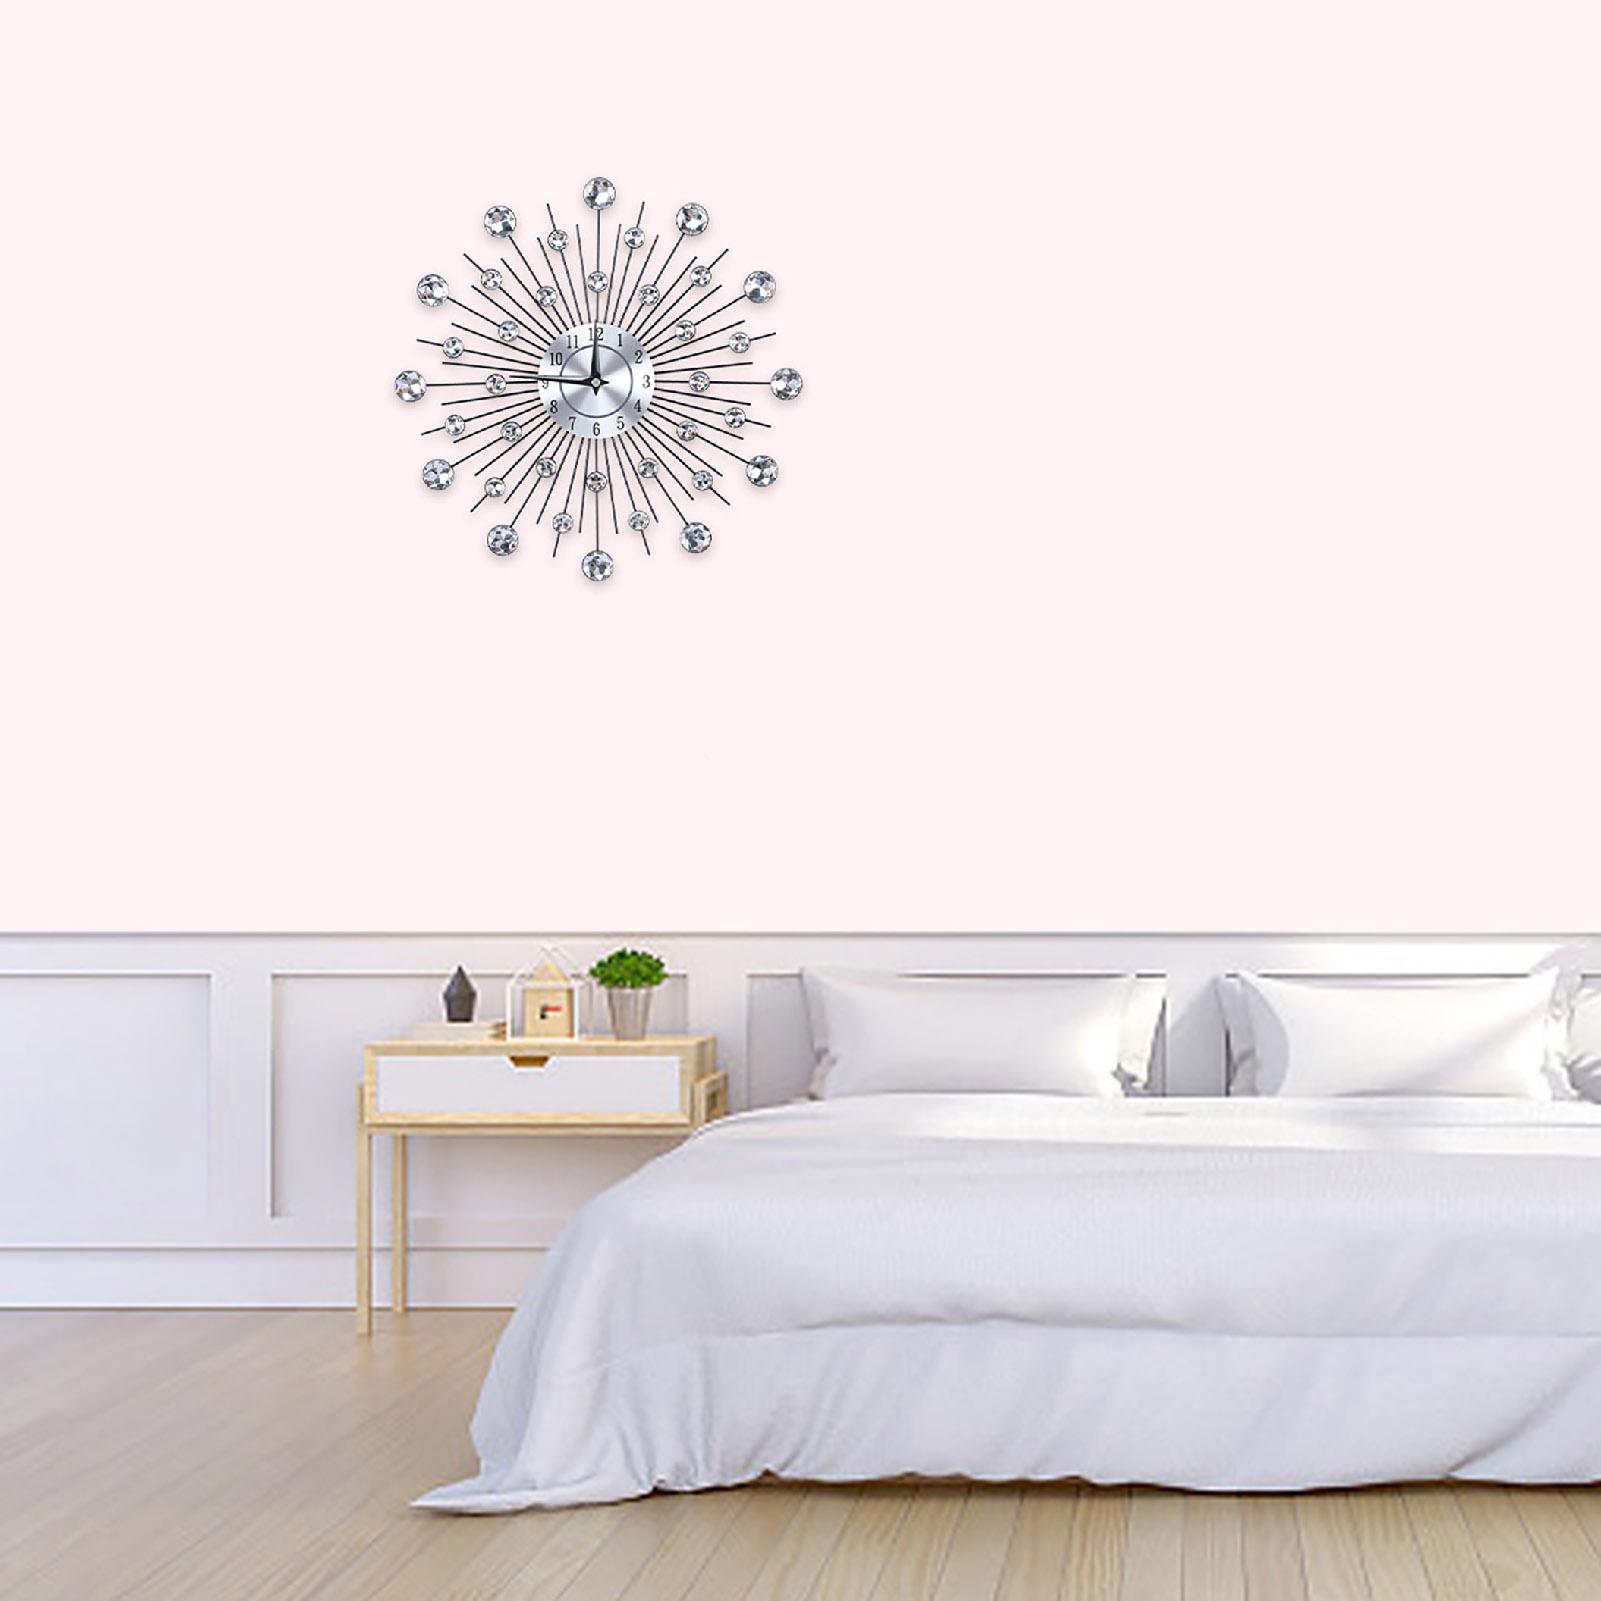 Sparkling-Bling-Metallic-DIY-Flower-Shaped-Wall-Clock-for-Living-Room-Office miniature 15